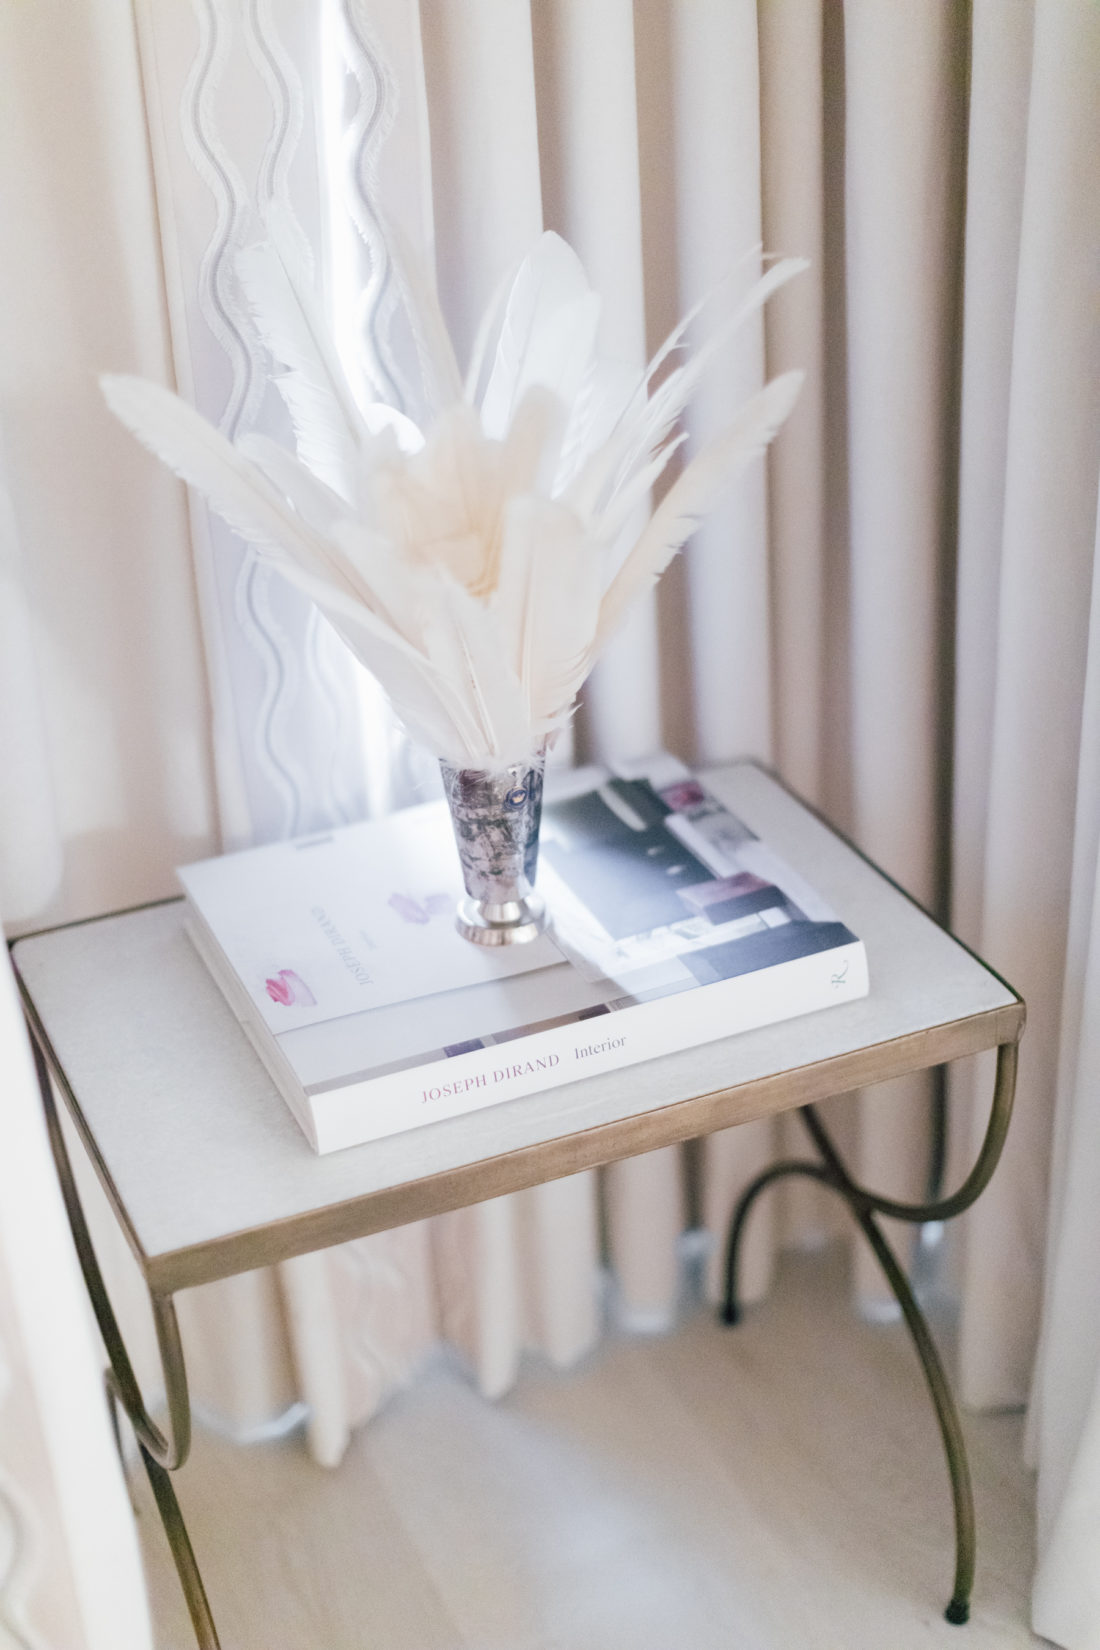 Details inside Eva Amurri Martino's new master bedroom